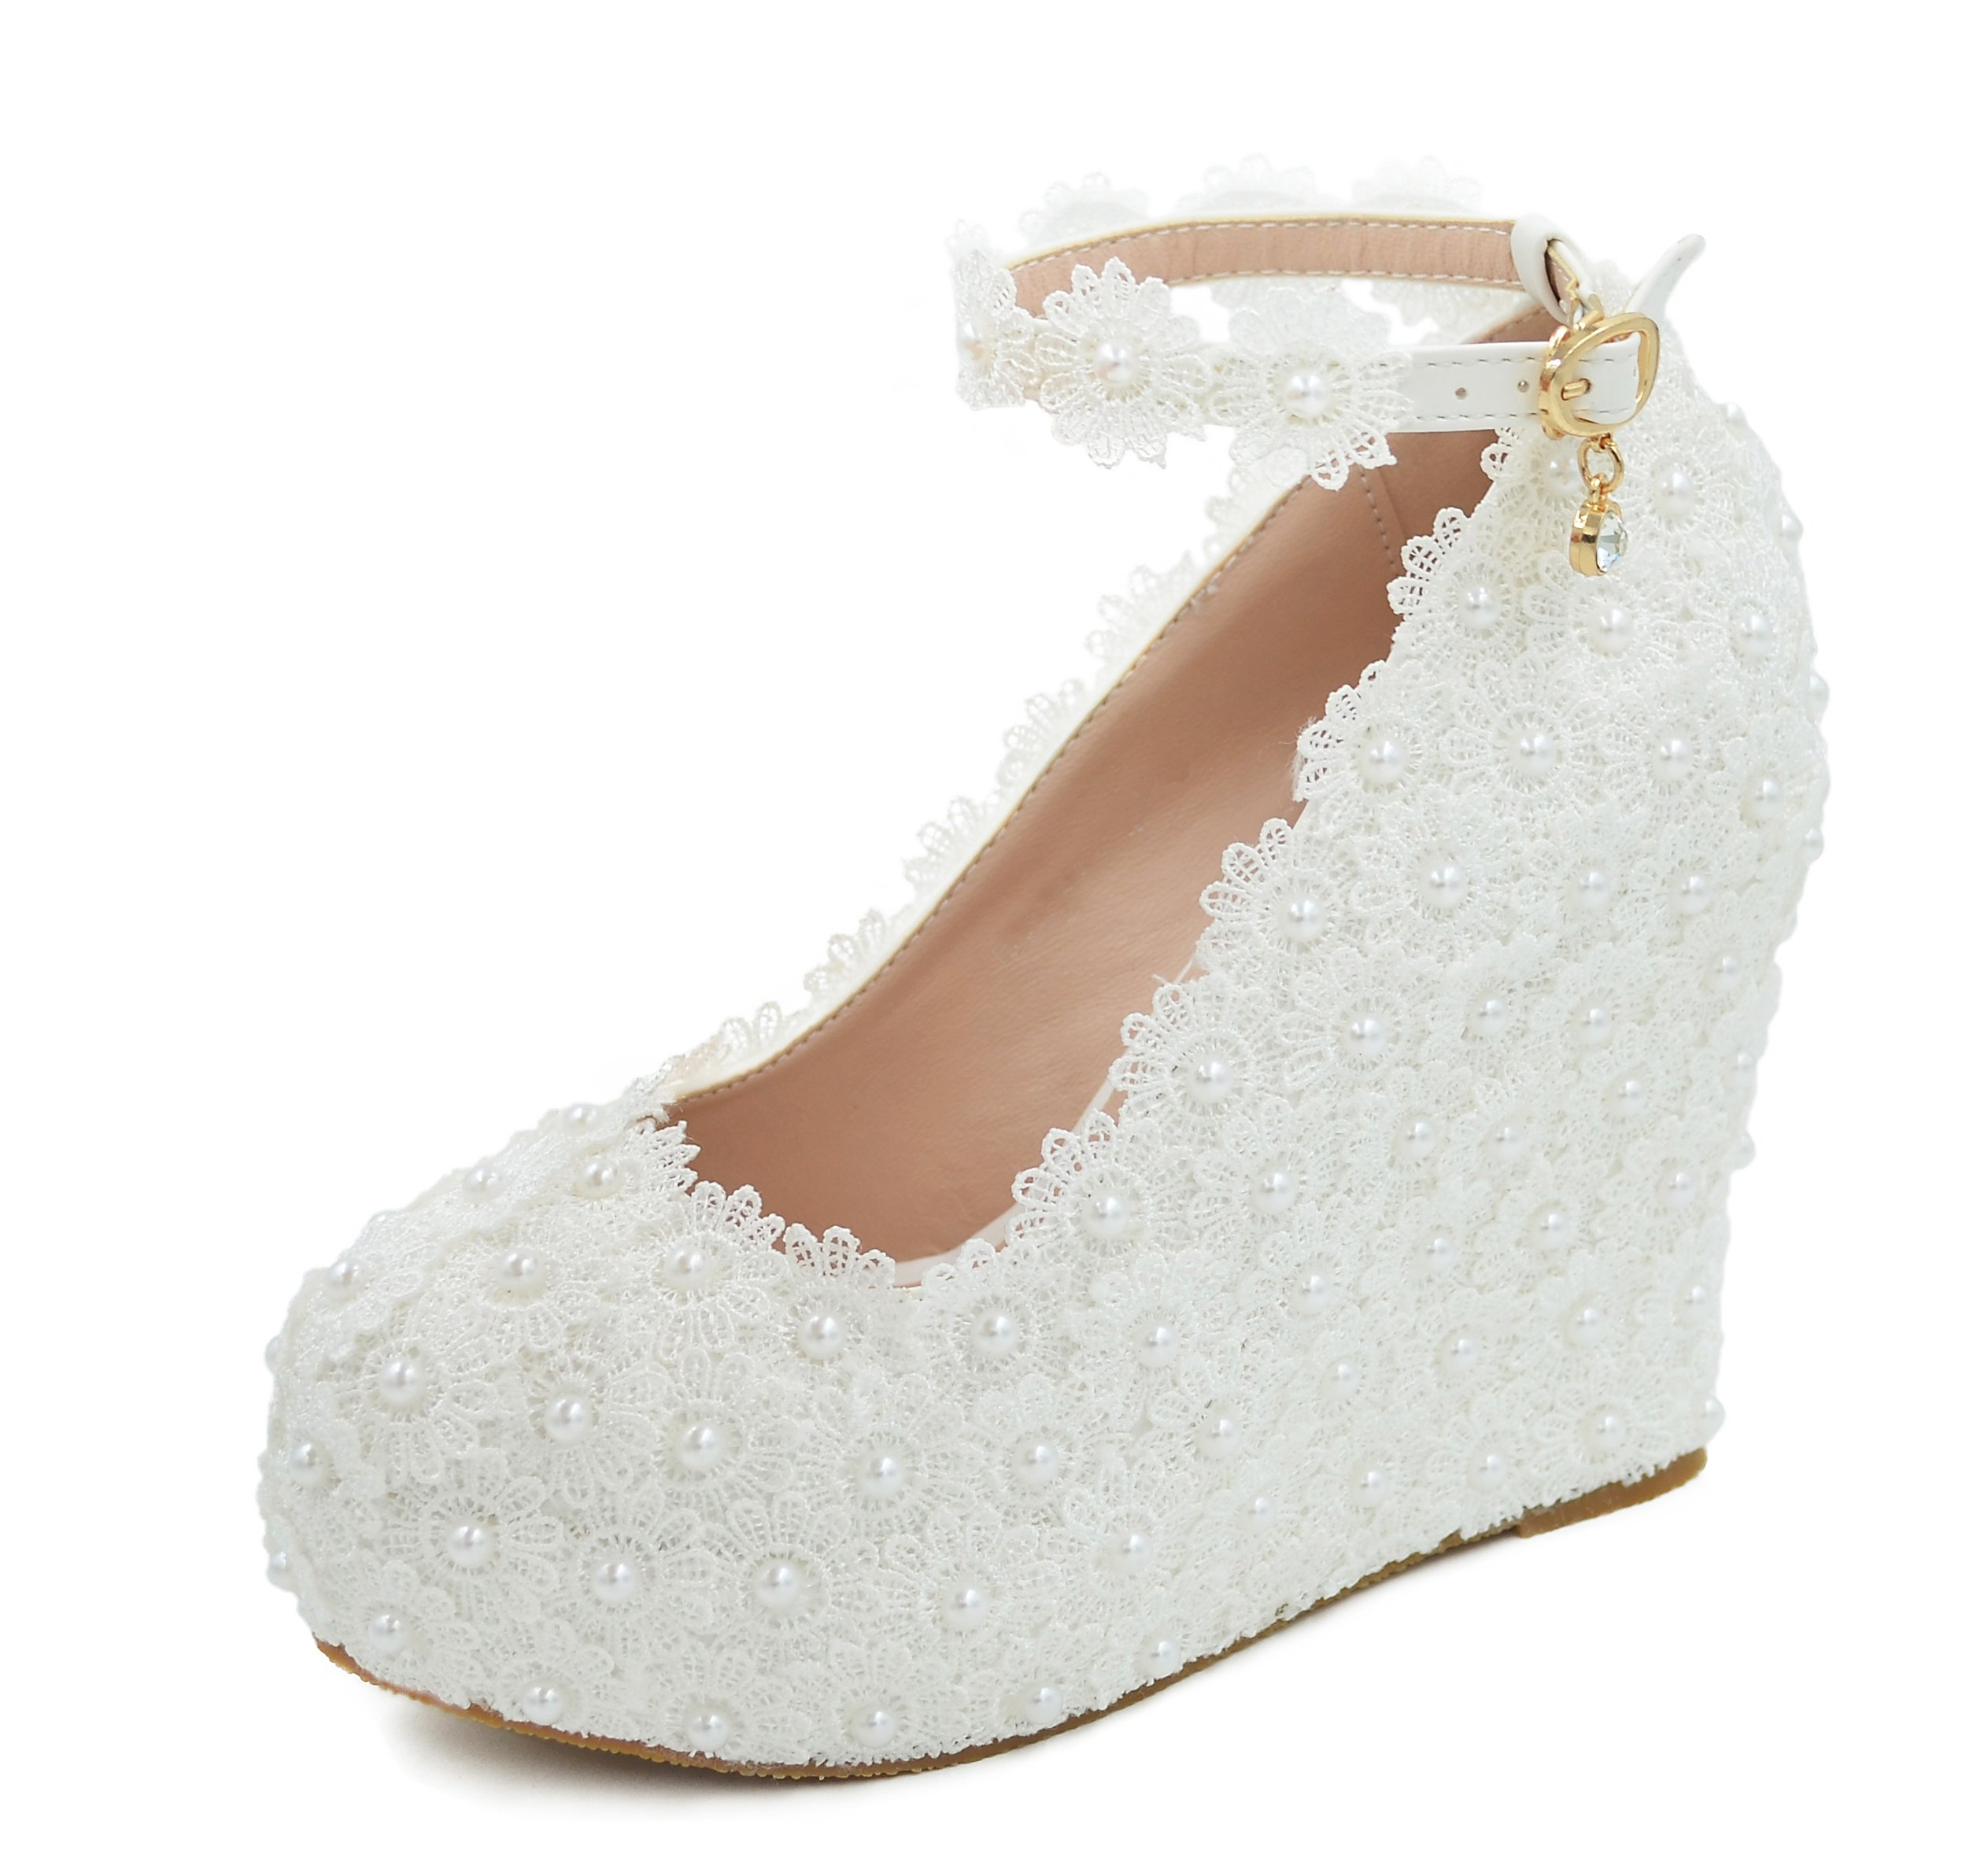 Melesh Lace Flower Pearls Wedge Platform High Heels Pump Bride Wedding Shoes (8.5 B(M) US, White)